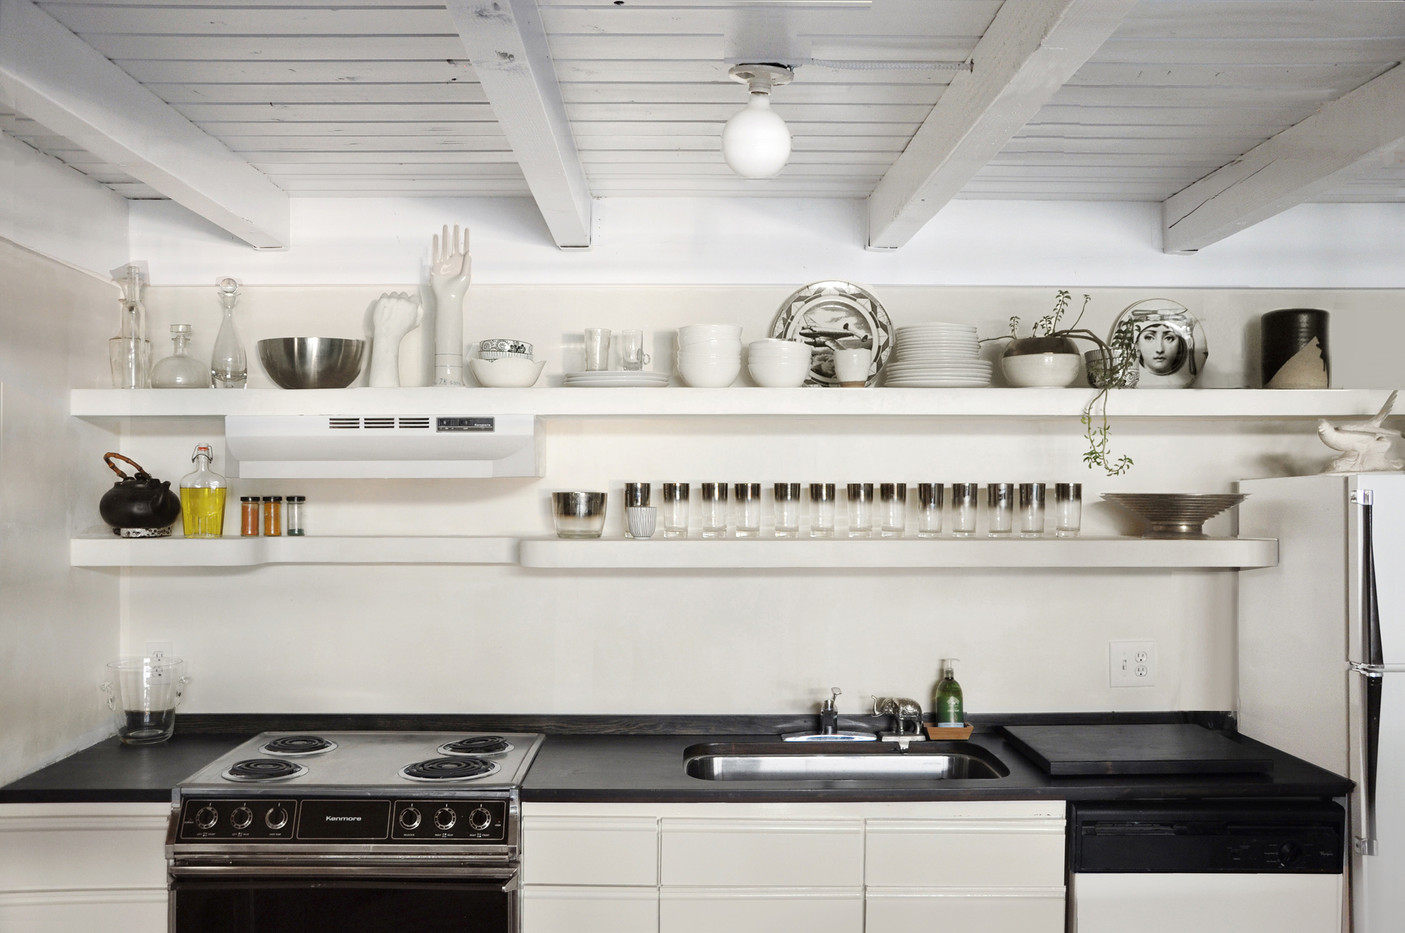 Kitchen.closeup.jpg